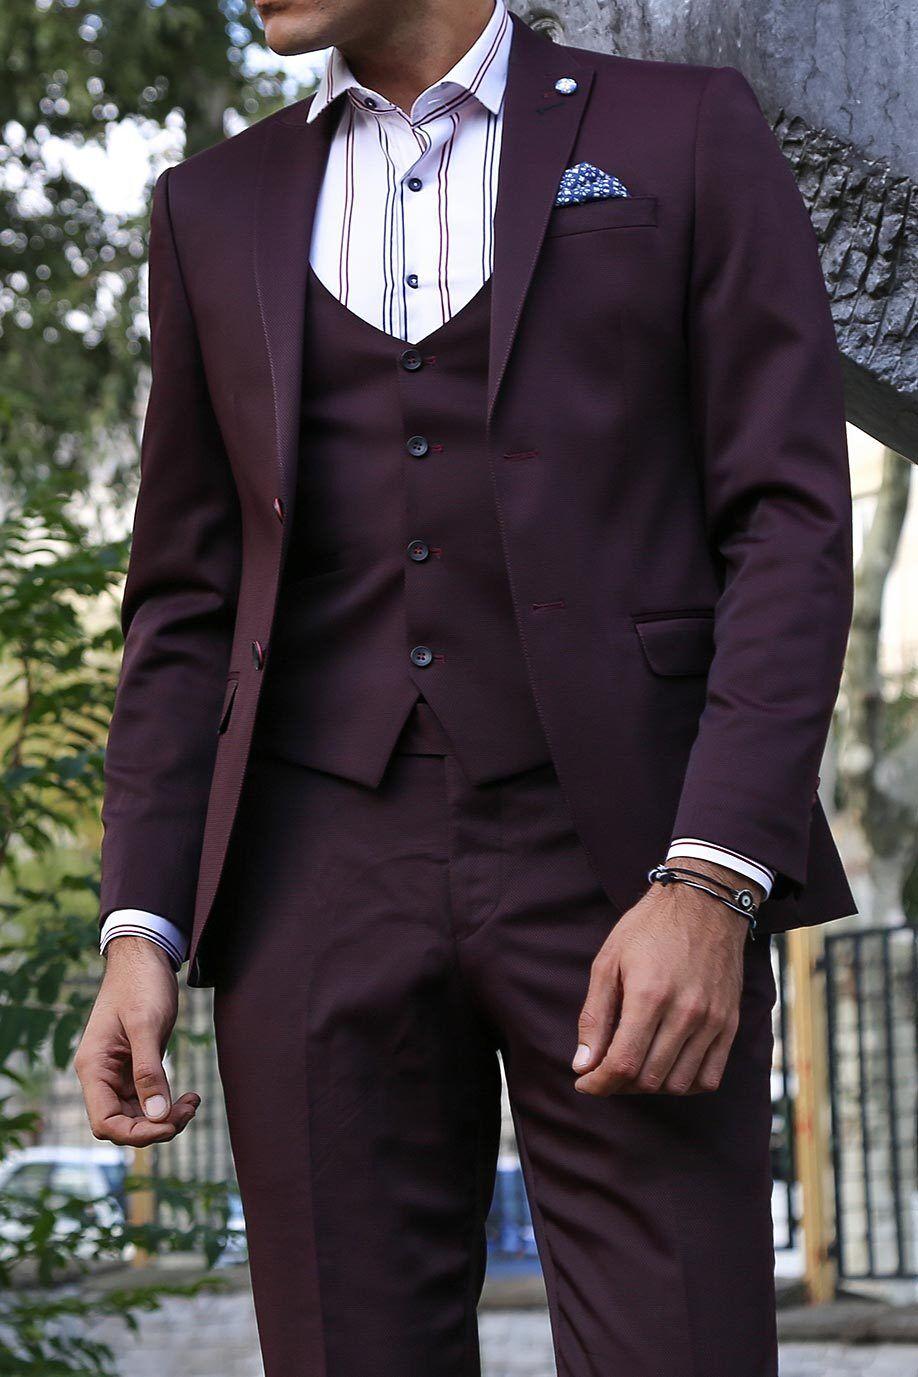 Men 3pc Vested Suit Turkey WESSI by J.VALINTIN European Slim Fit 118-80 Burgundy